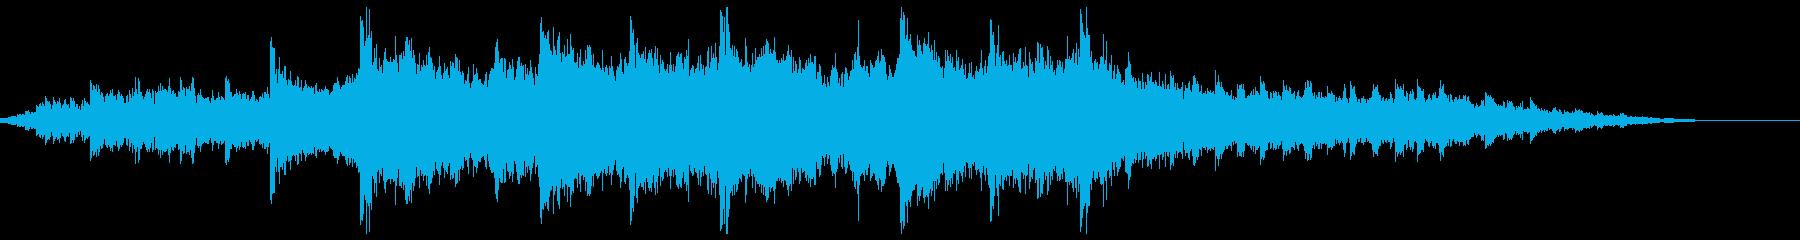 texture14の再生済みの波形